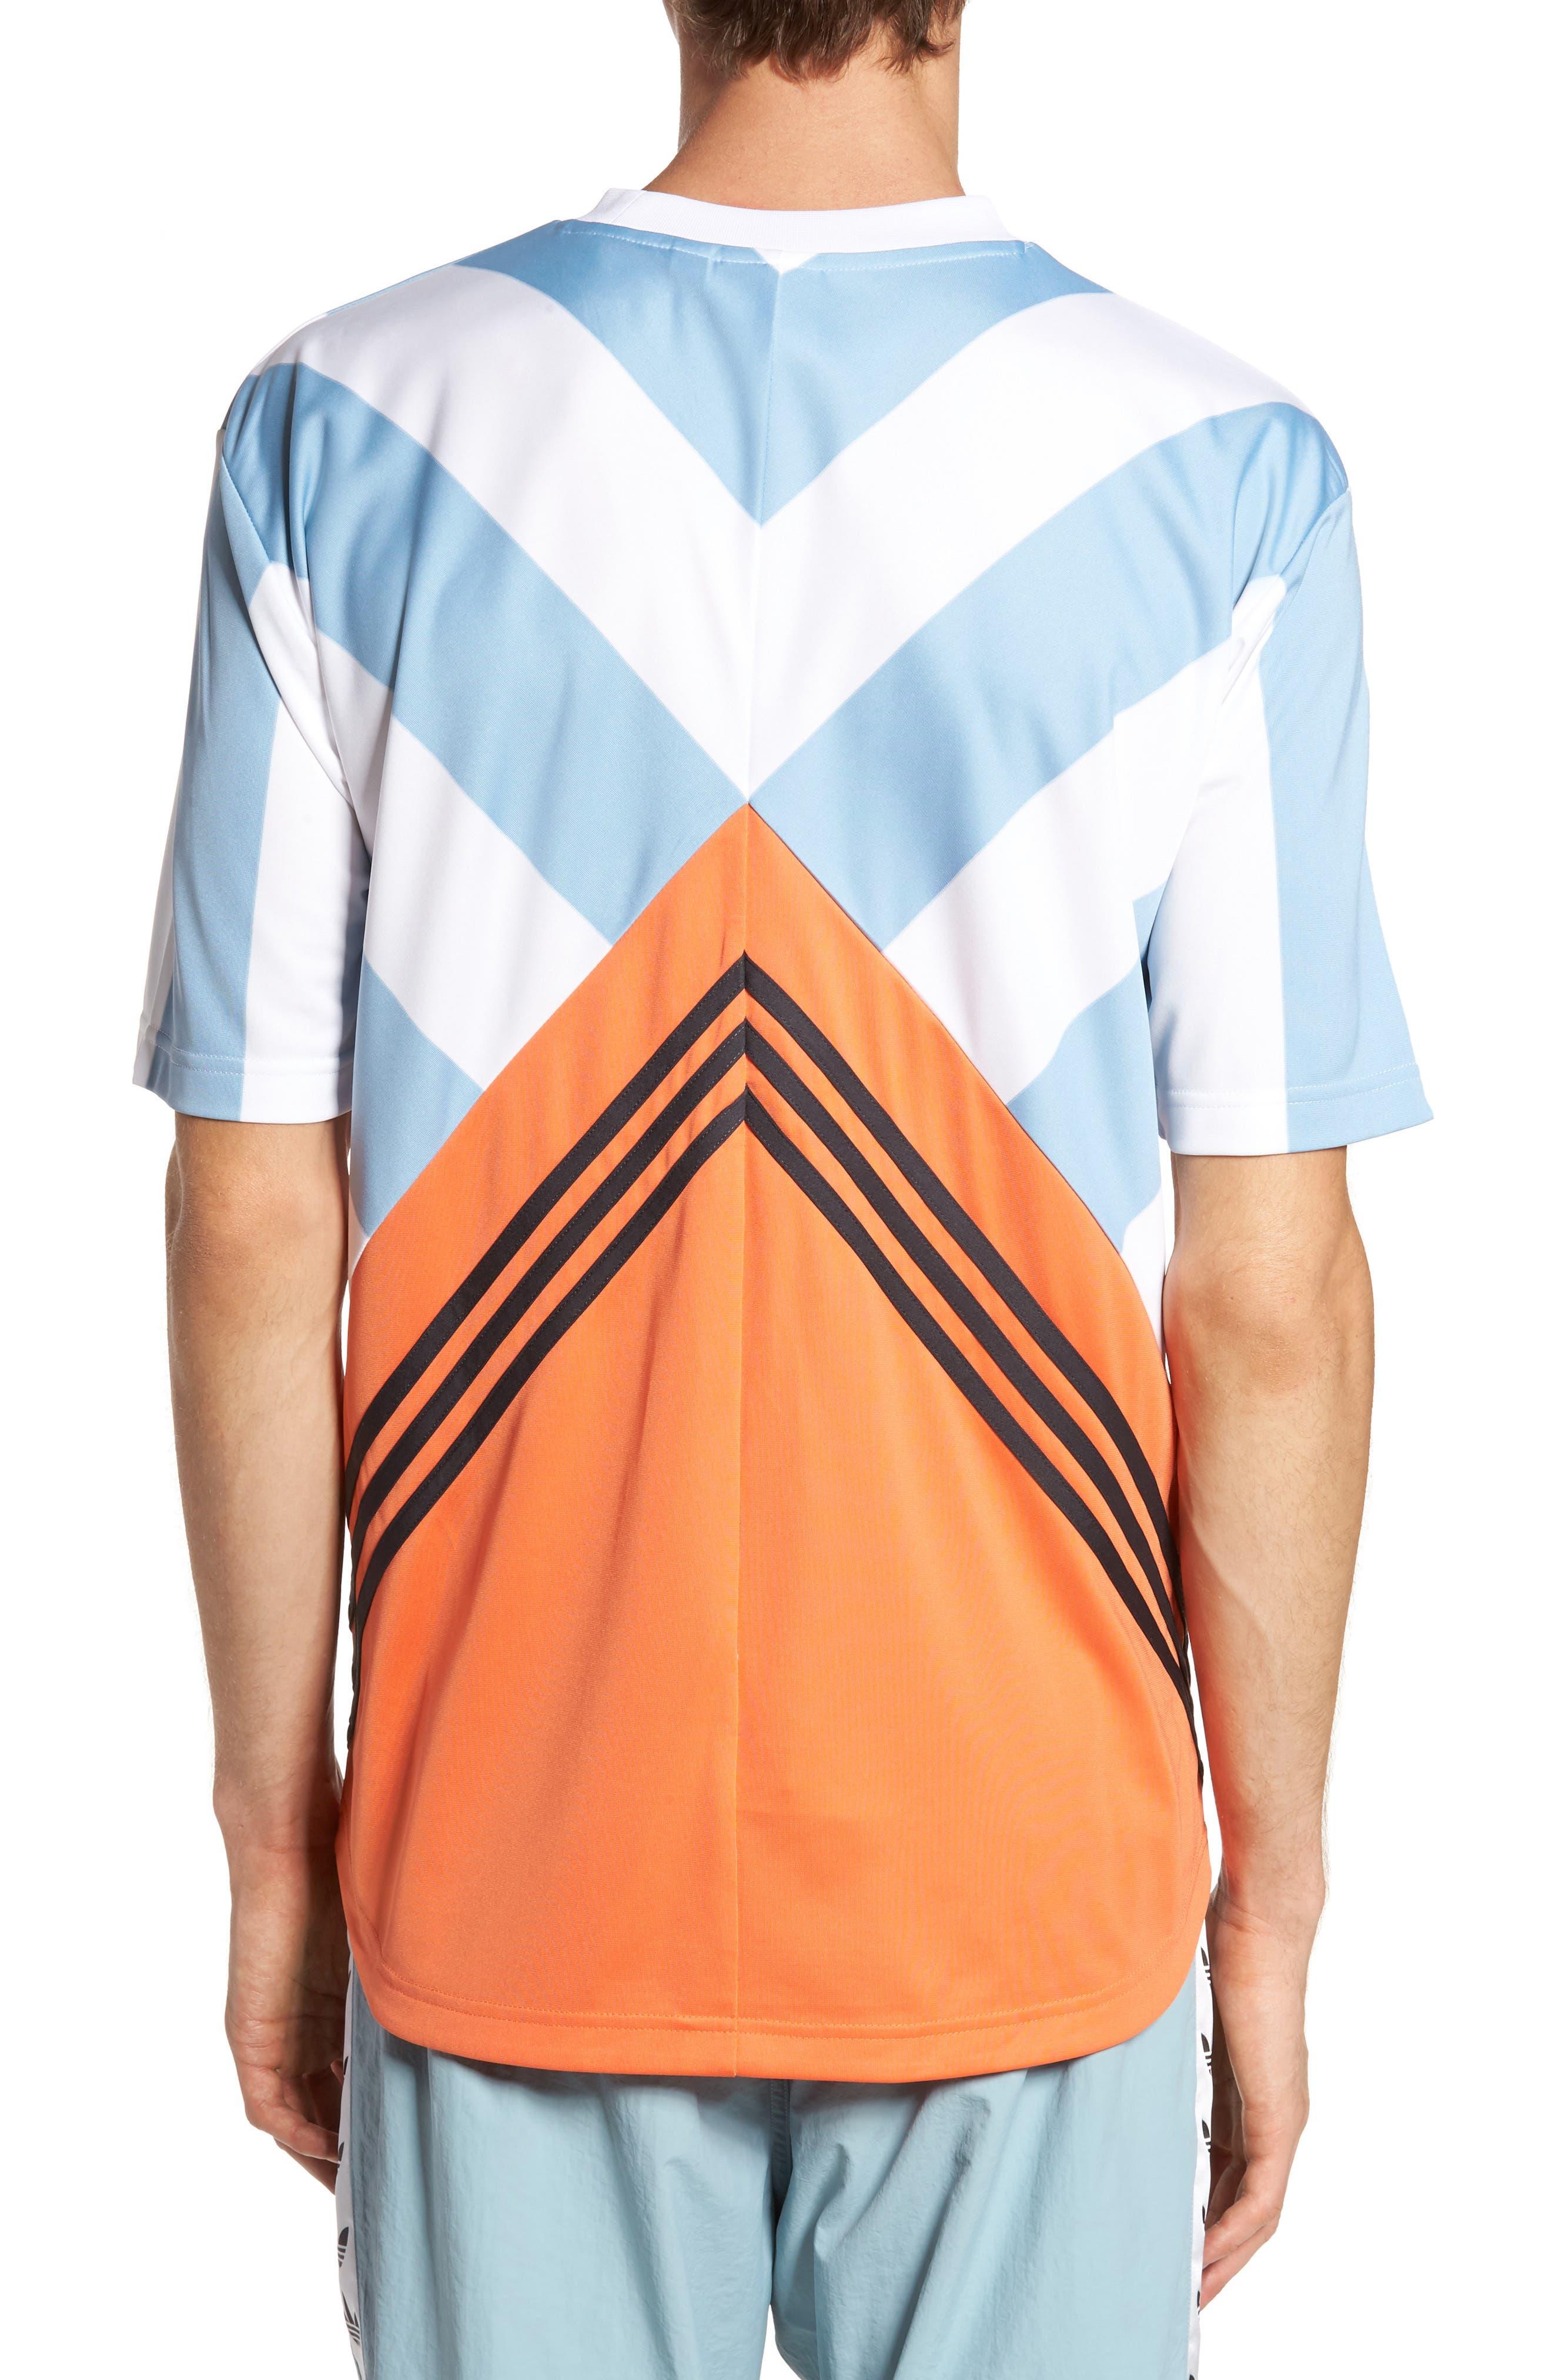 Originals Rival Goalie T-Shirt,                             Alternate thumbnail 2, color,                             Ash Grey/ White